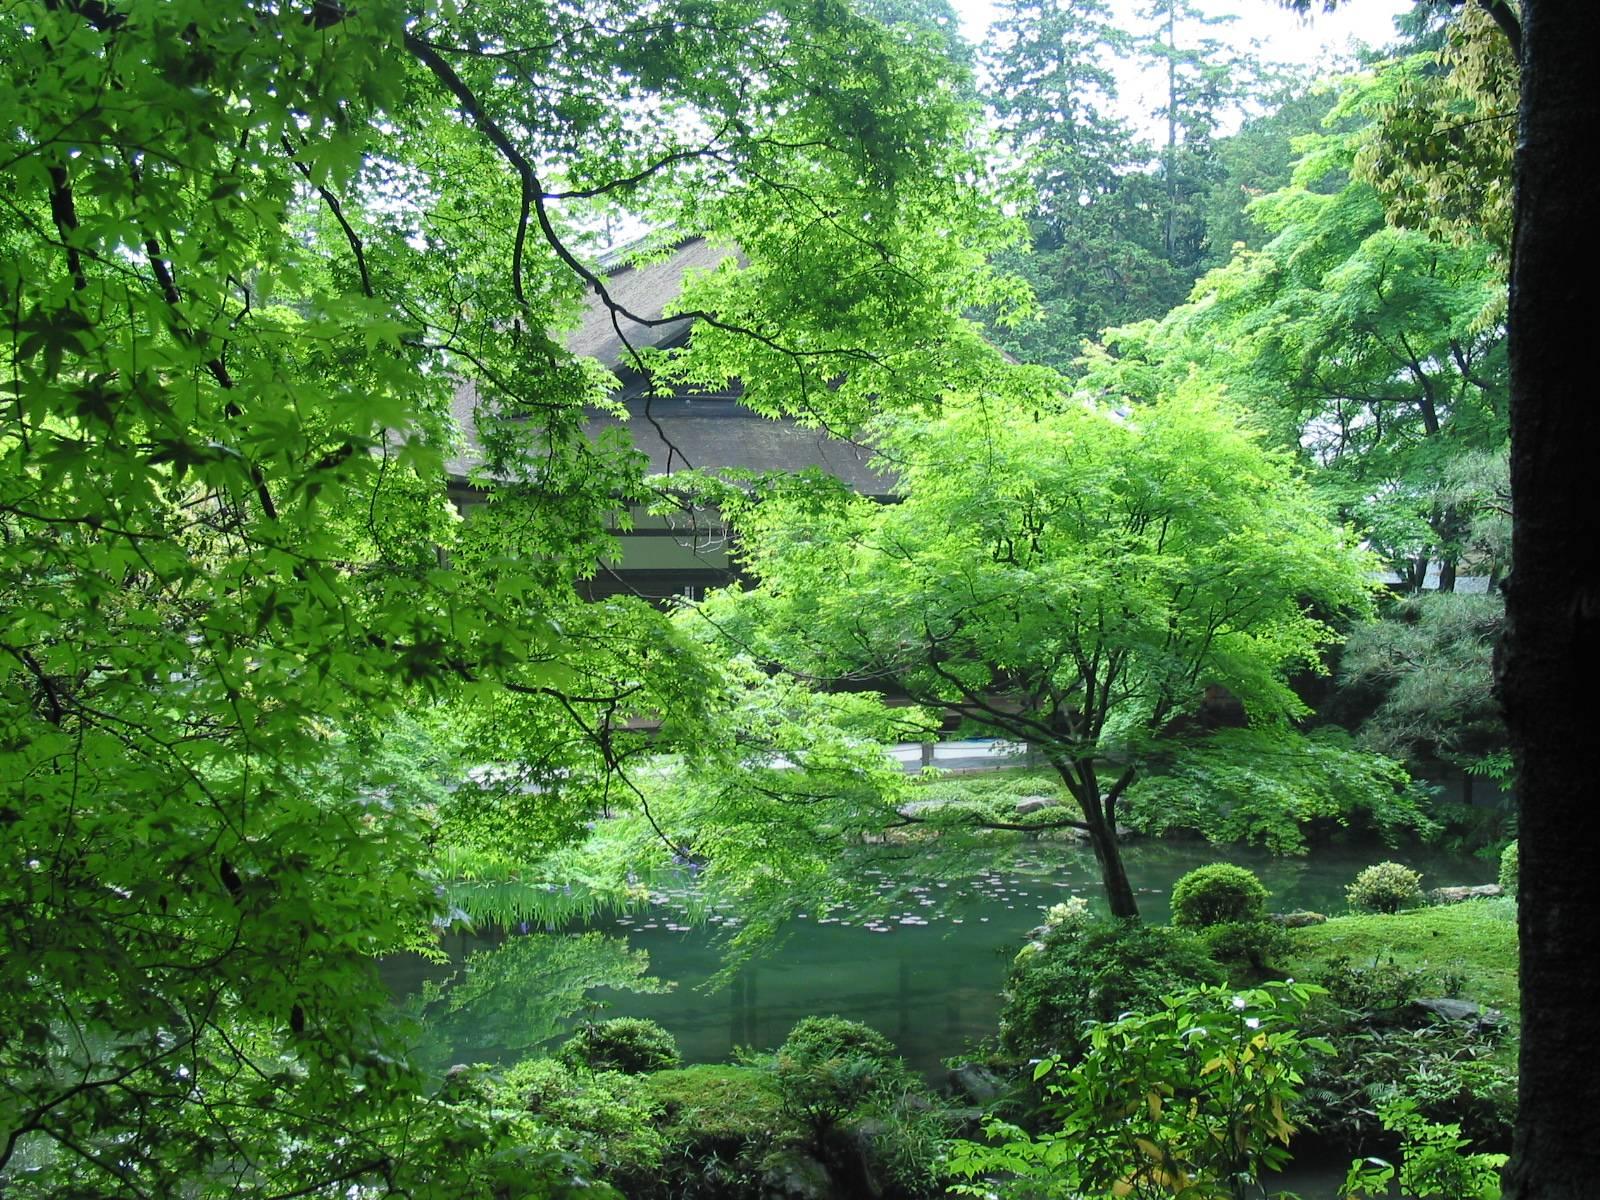 garden wallpaper zen 1920x1080px - photo #18